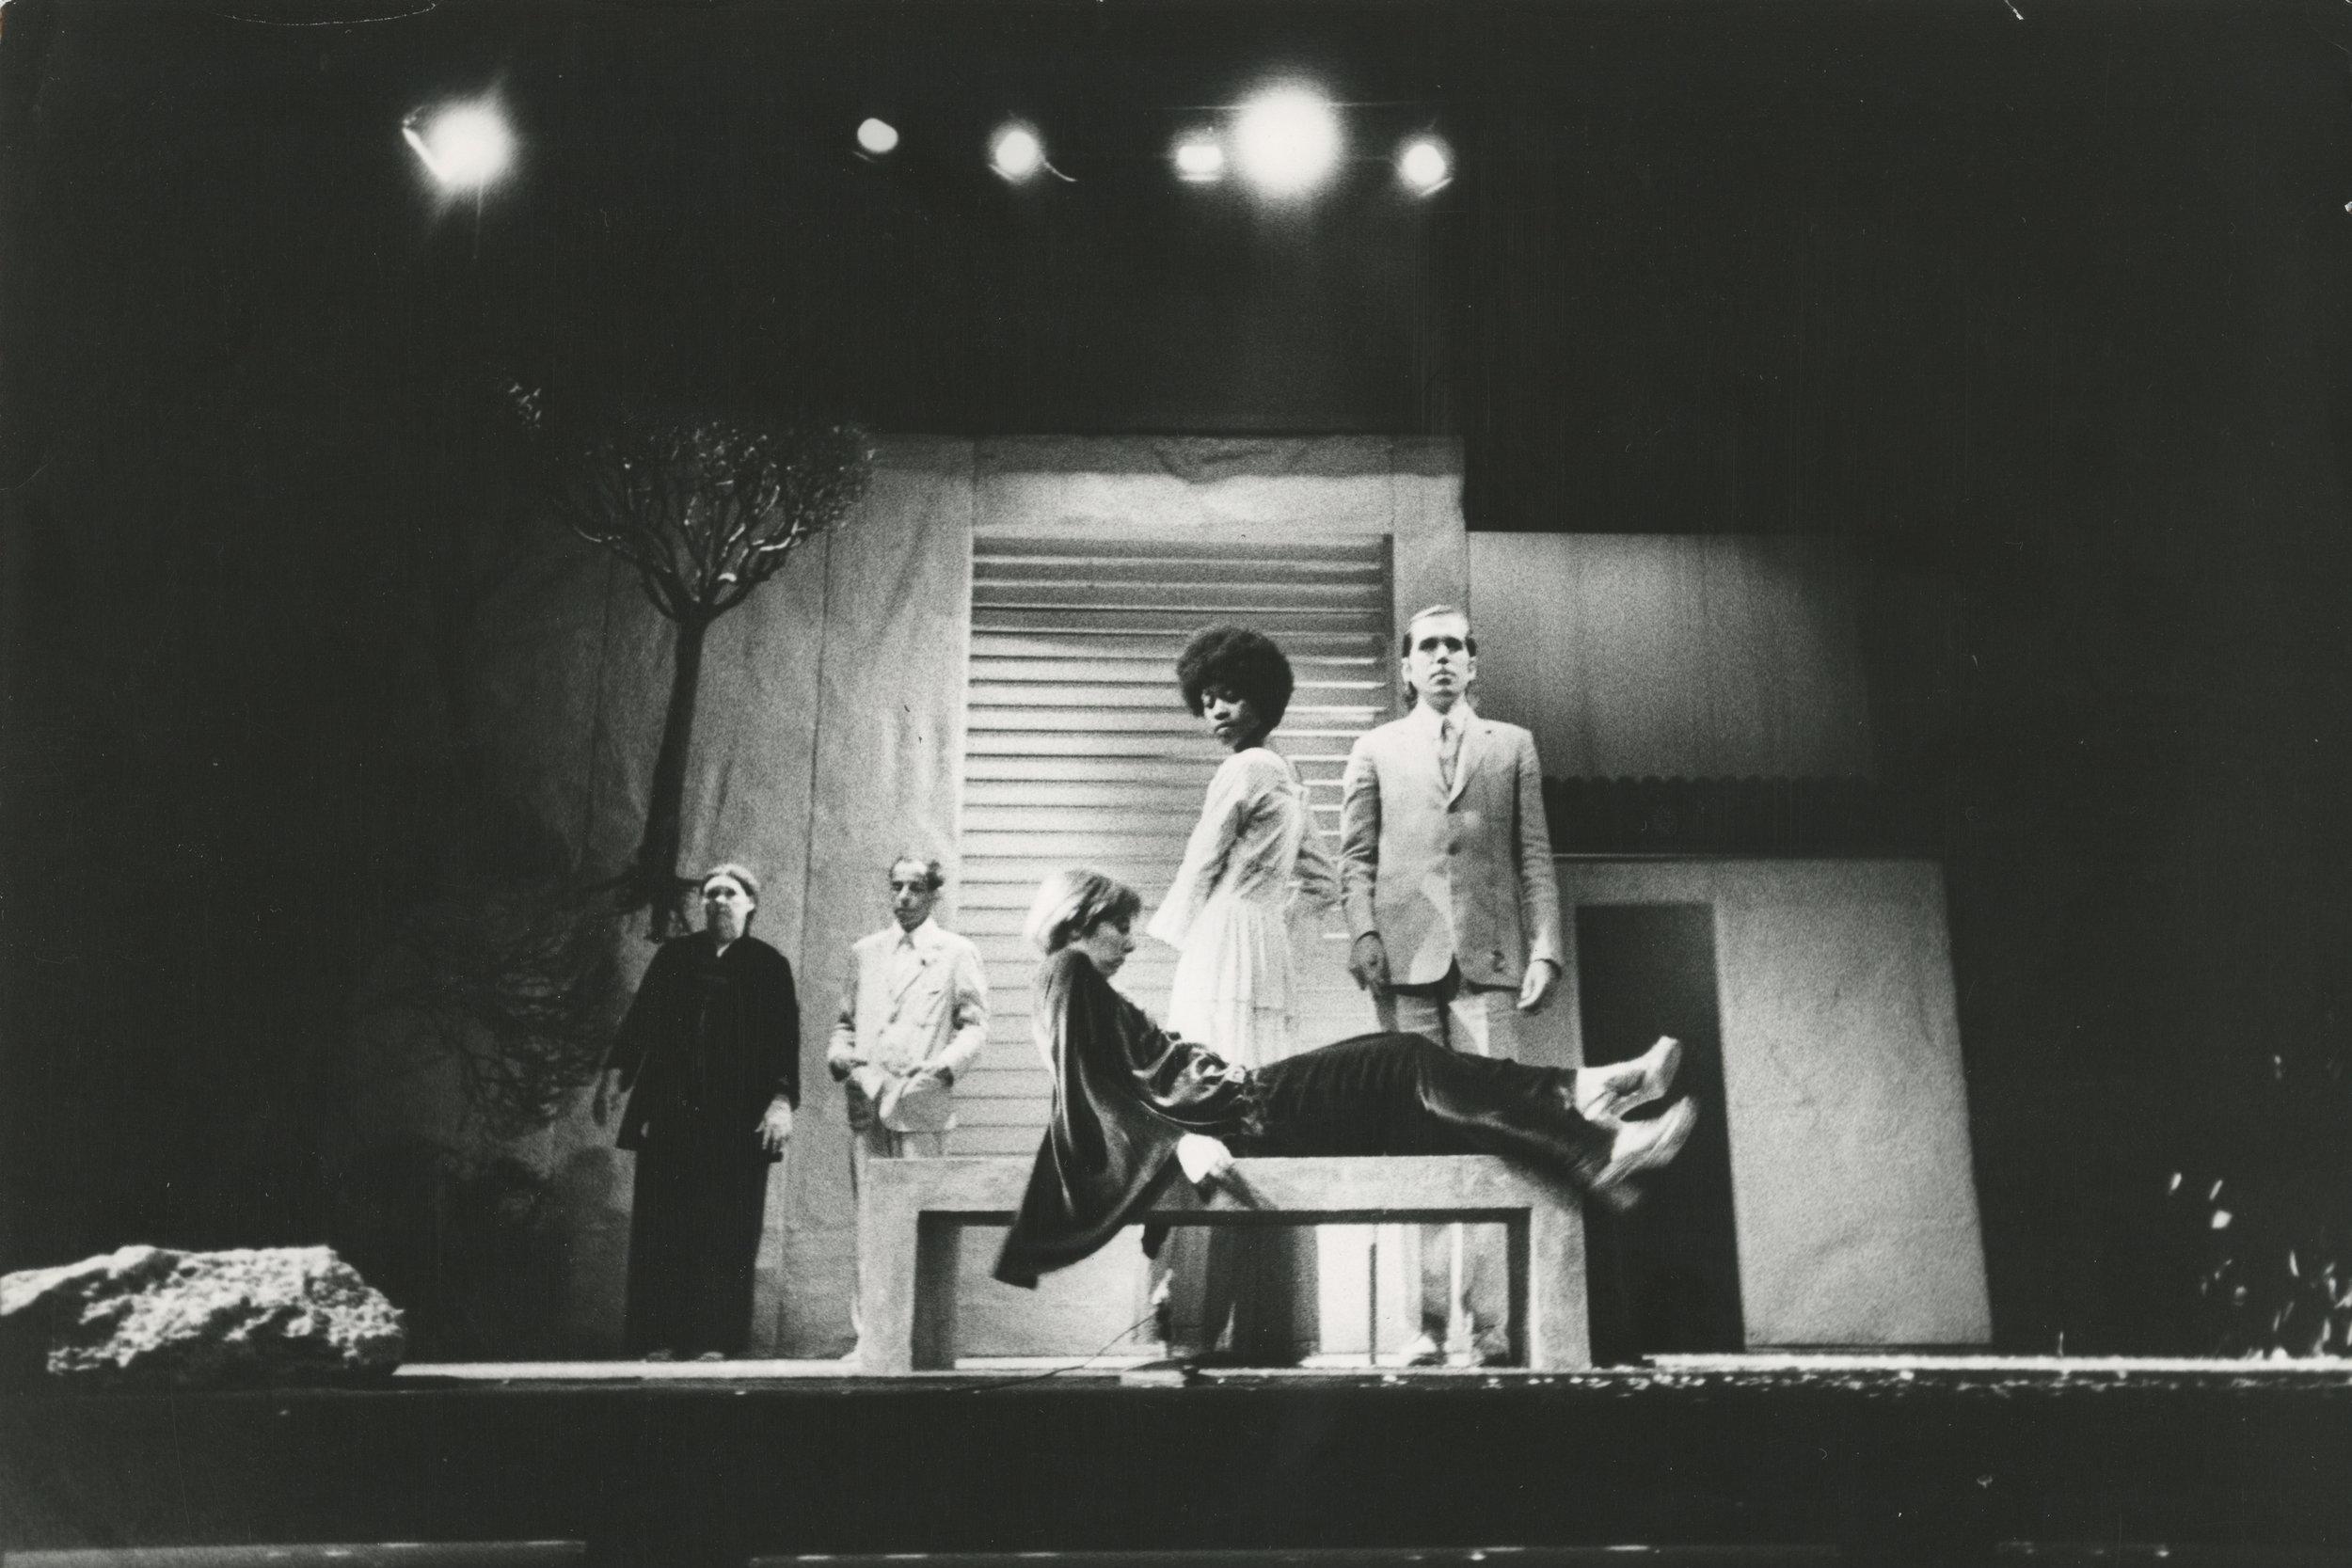 Act 4, Section 2: Scotty Snyder, Stefan Brecht, Kathryn Cation, Sheryl Sutton, James Neu